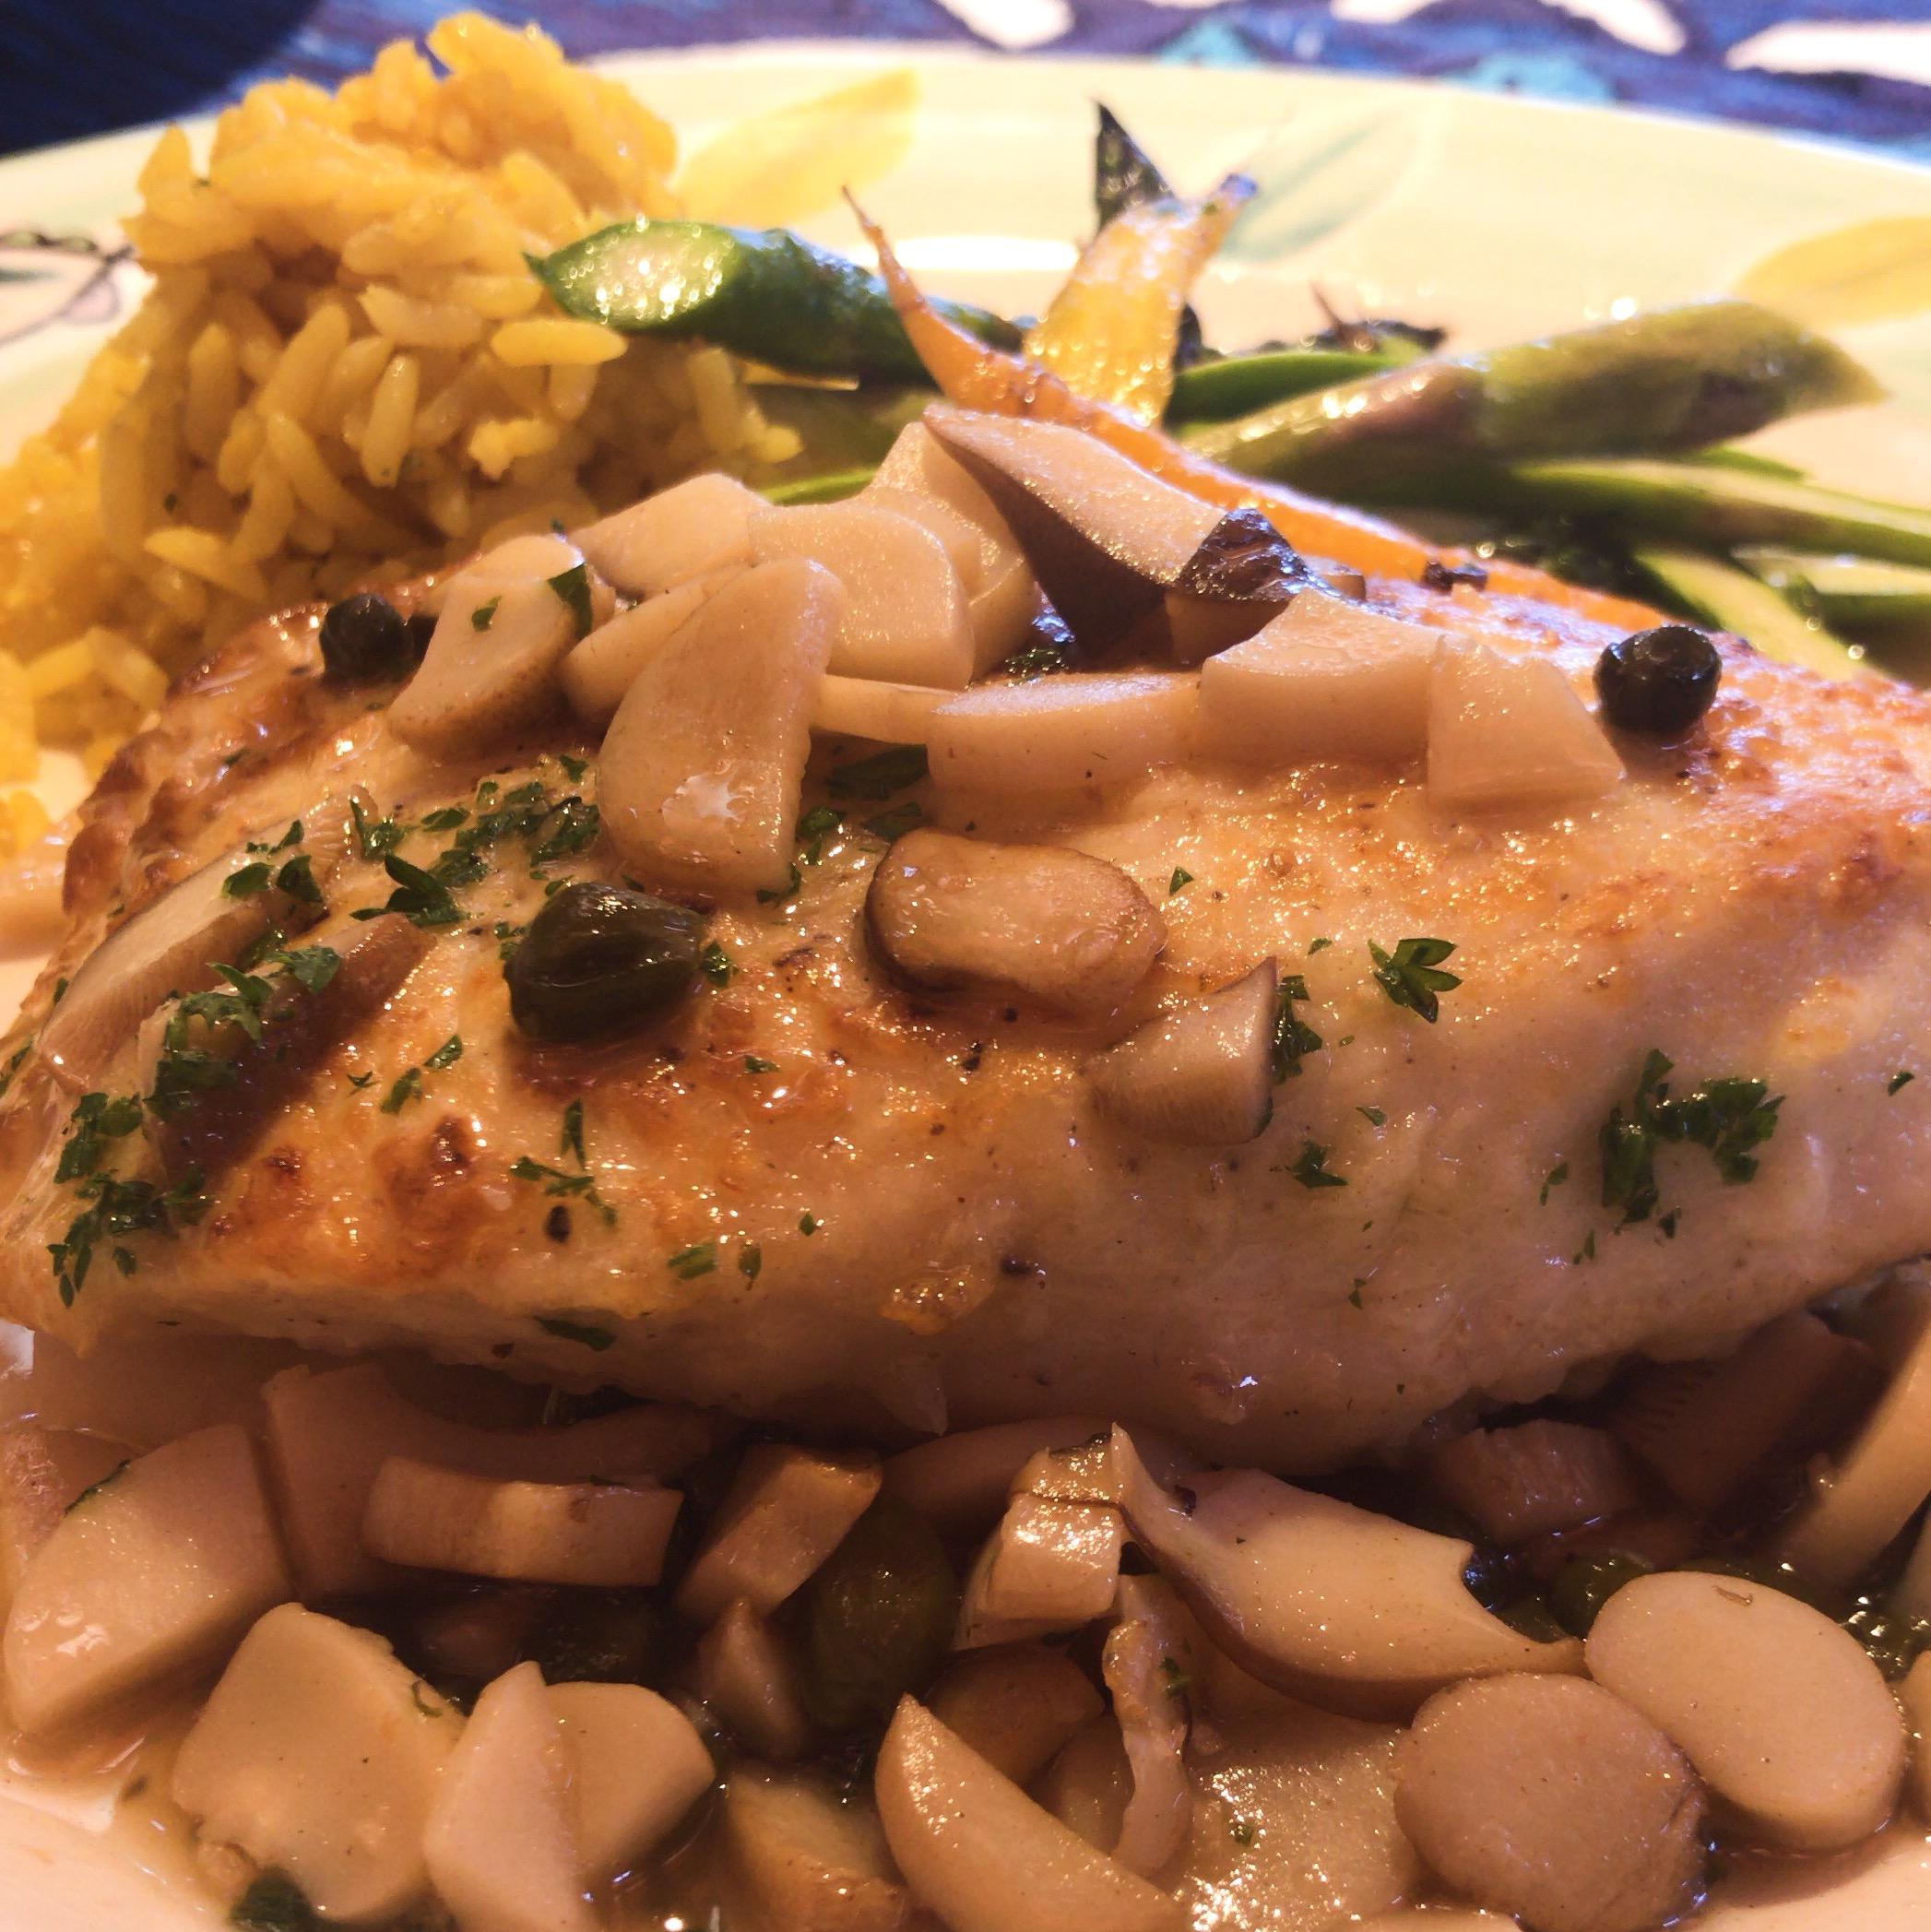 Mamas Fish House, Best Restaurants in Maui, HI. Wahoo Dinner.